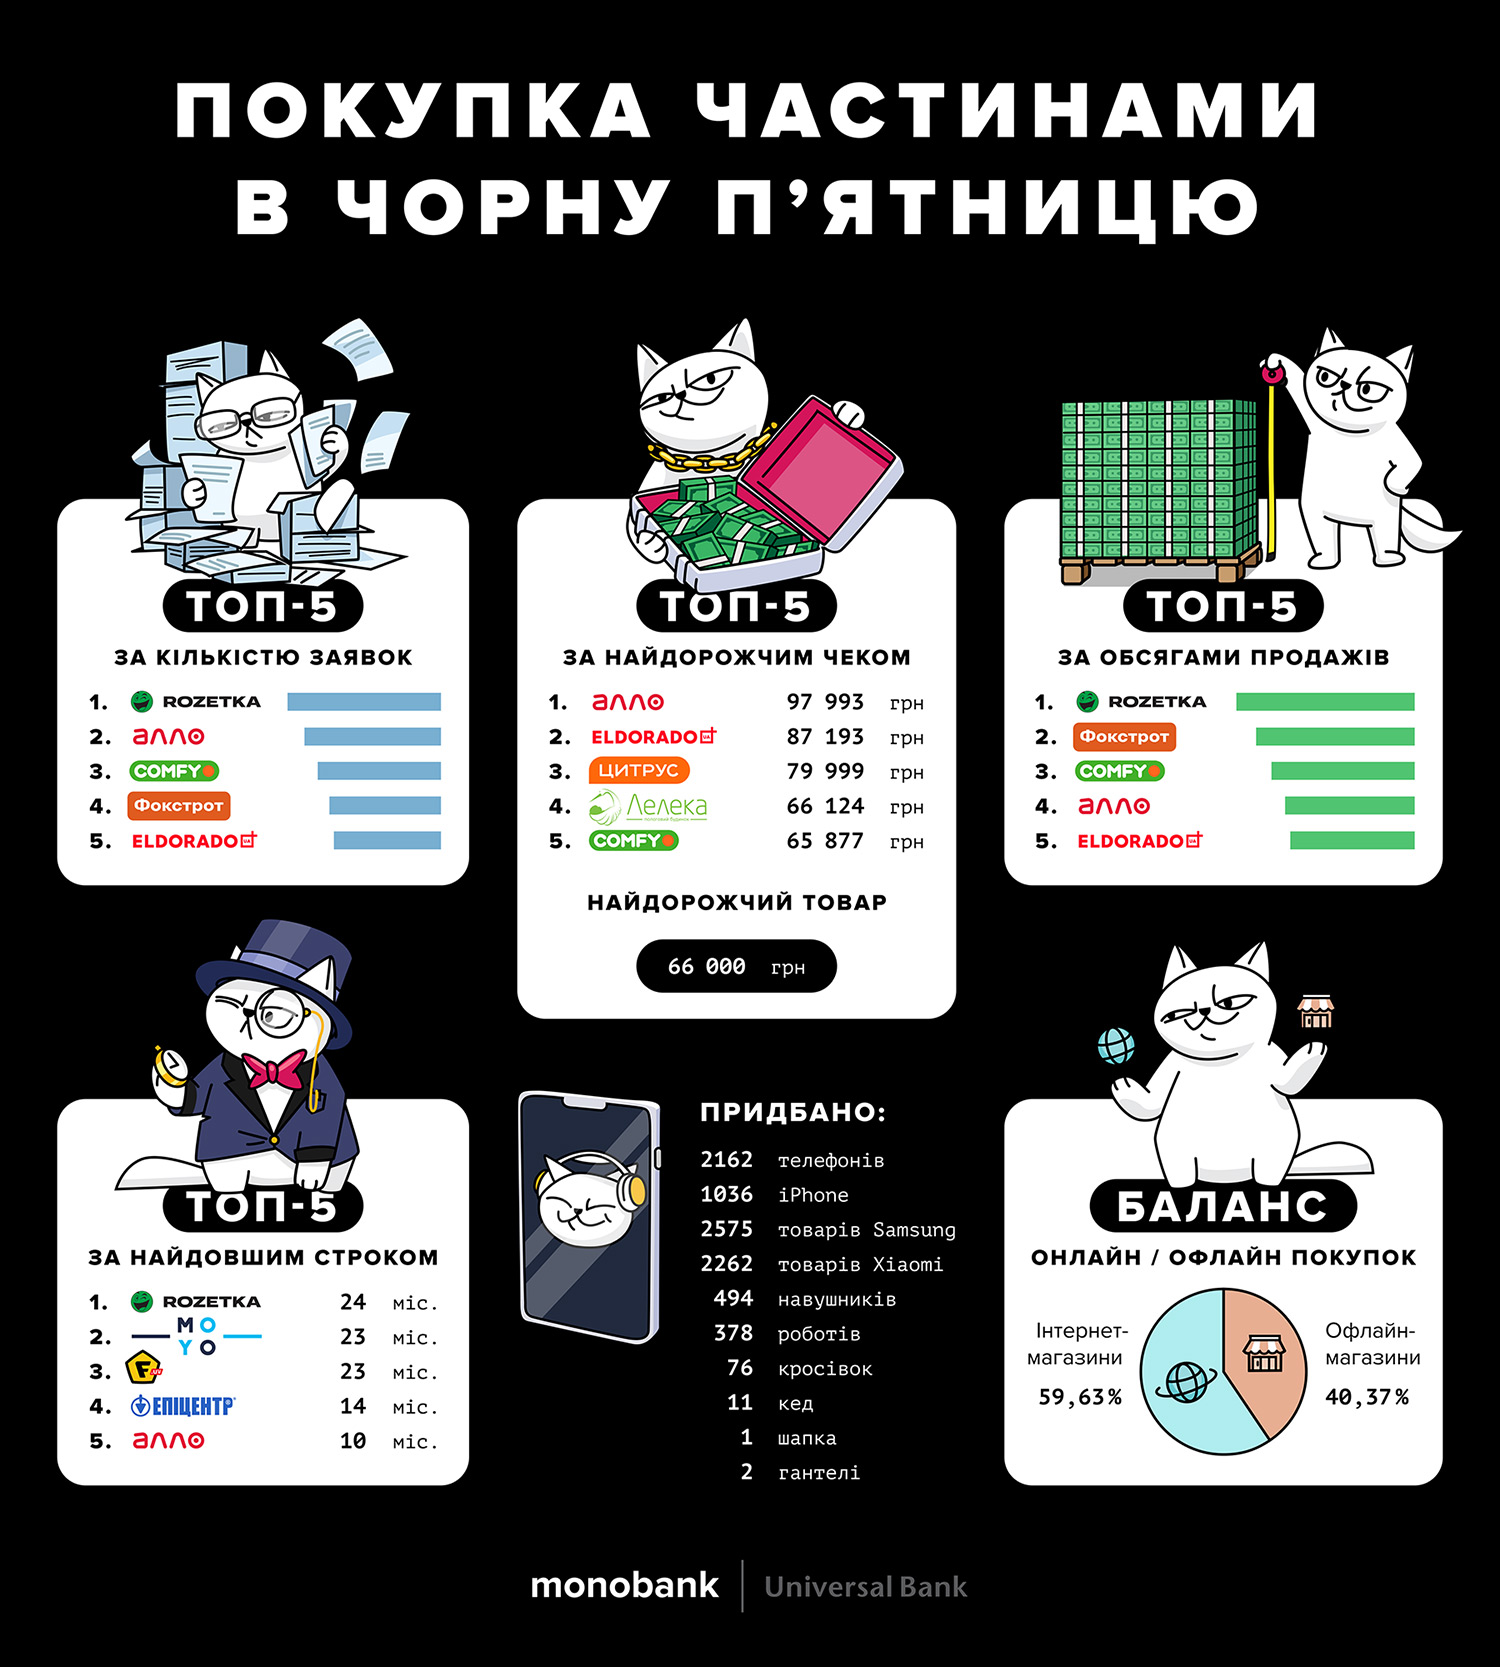 Hire Purchase on Black Friday, monobank infographic design.